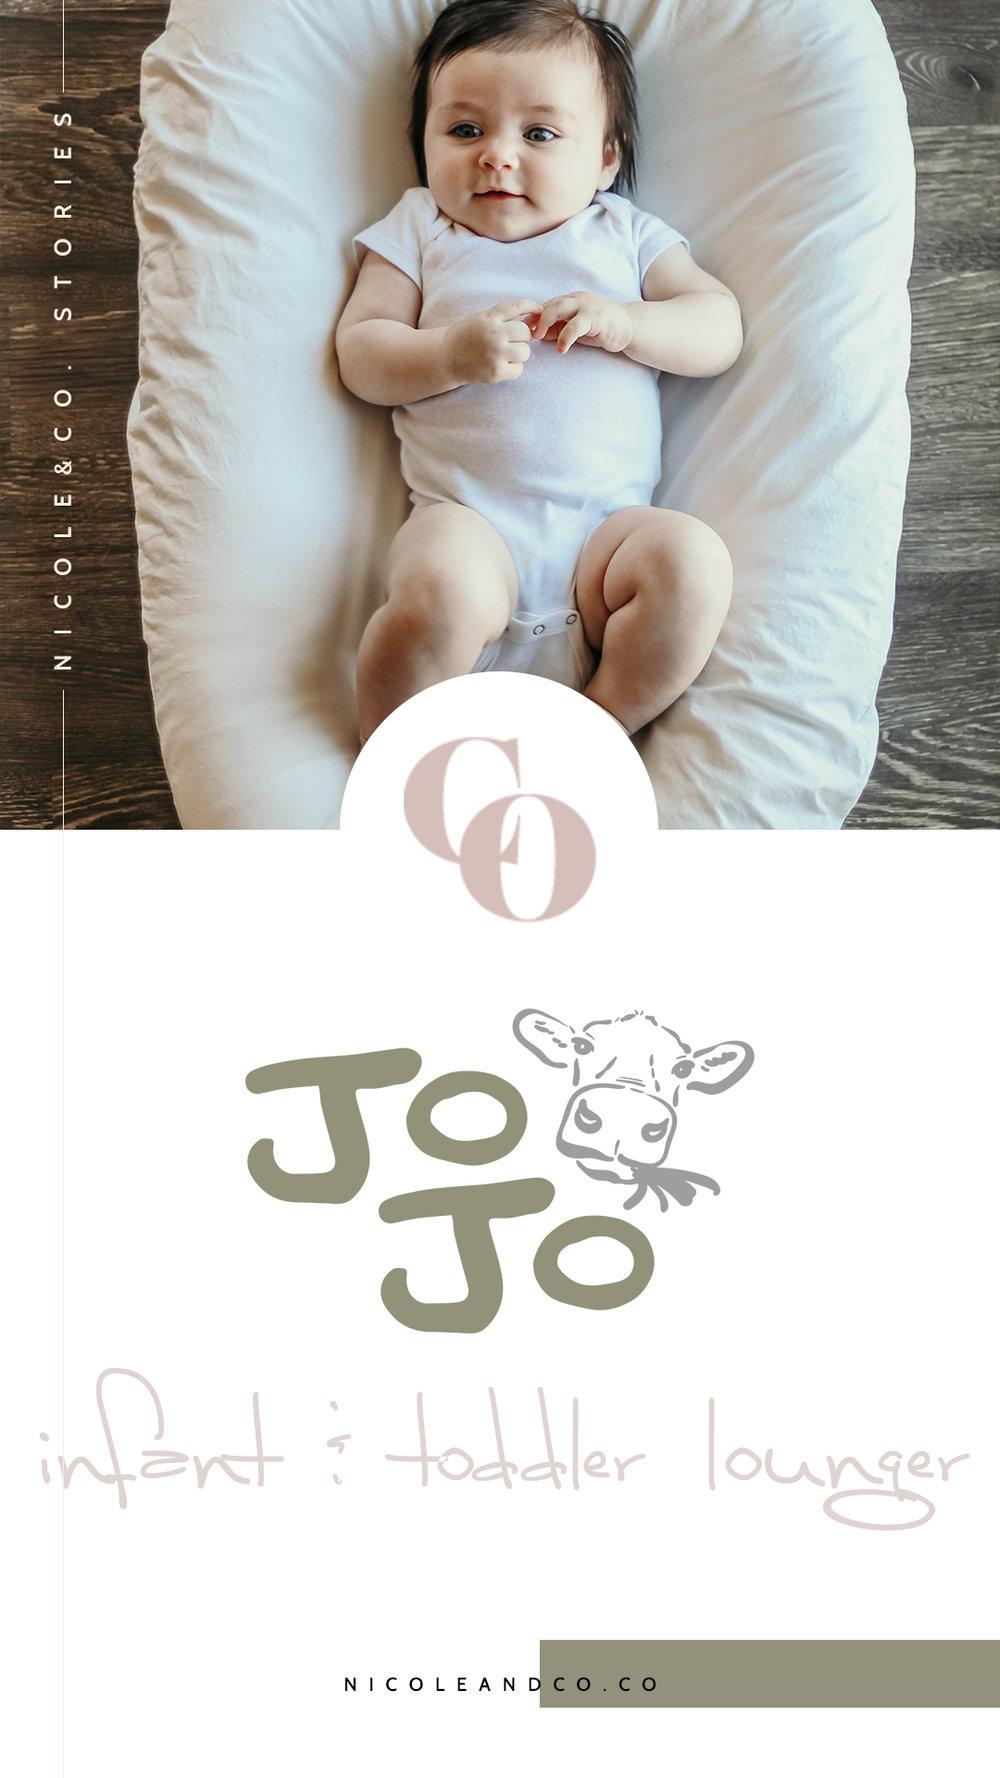 Stories-JoJo.jpg